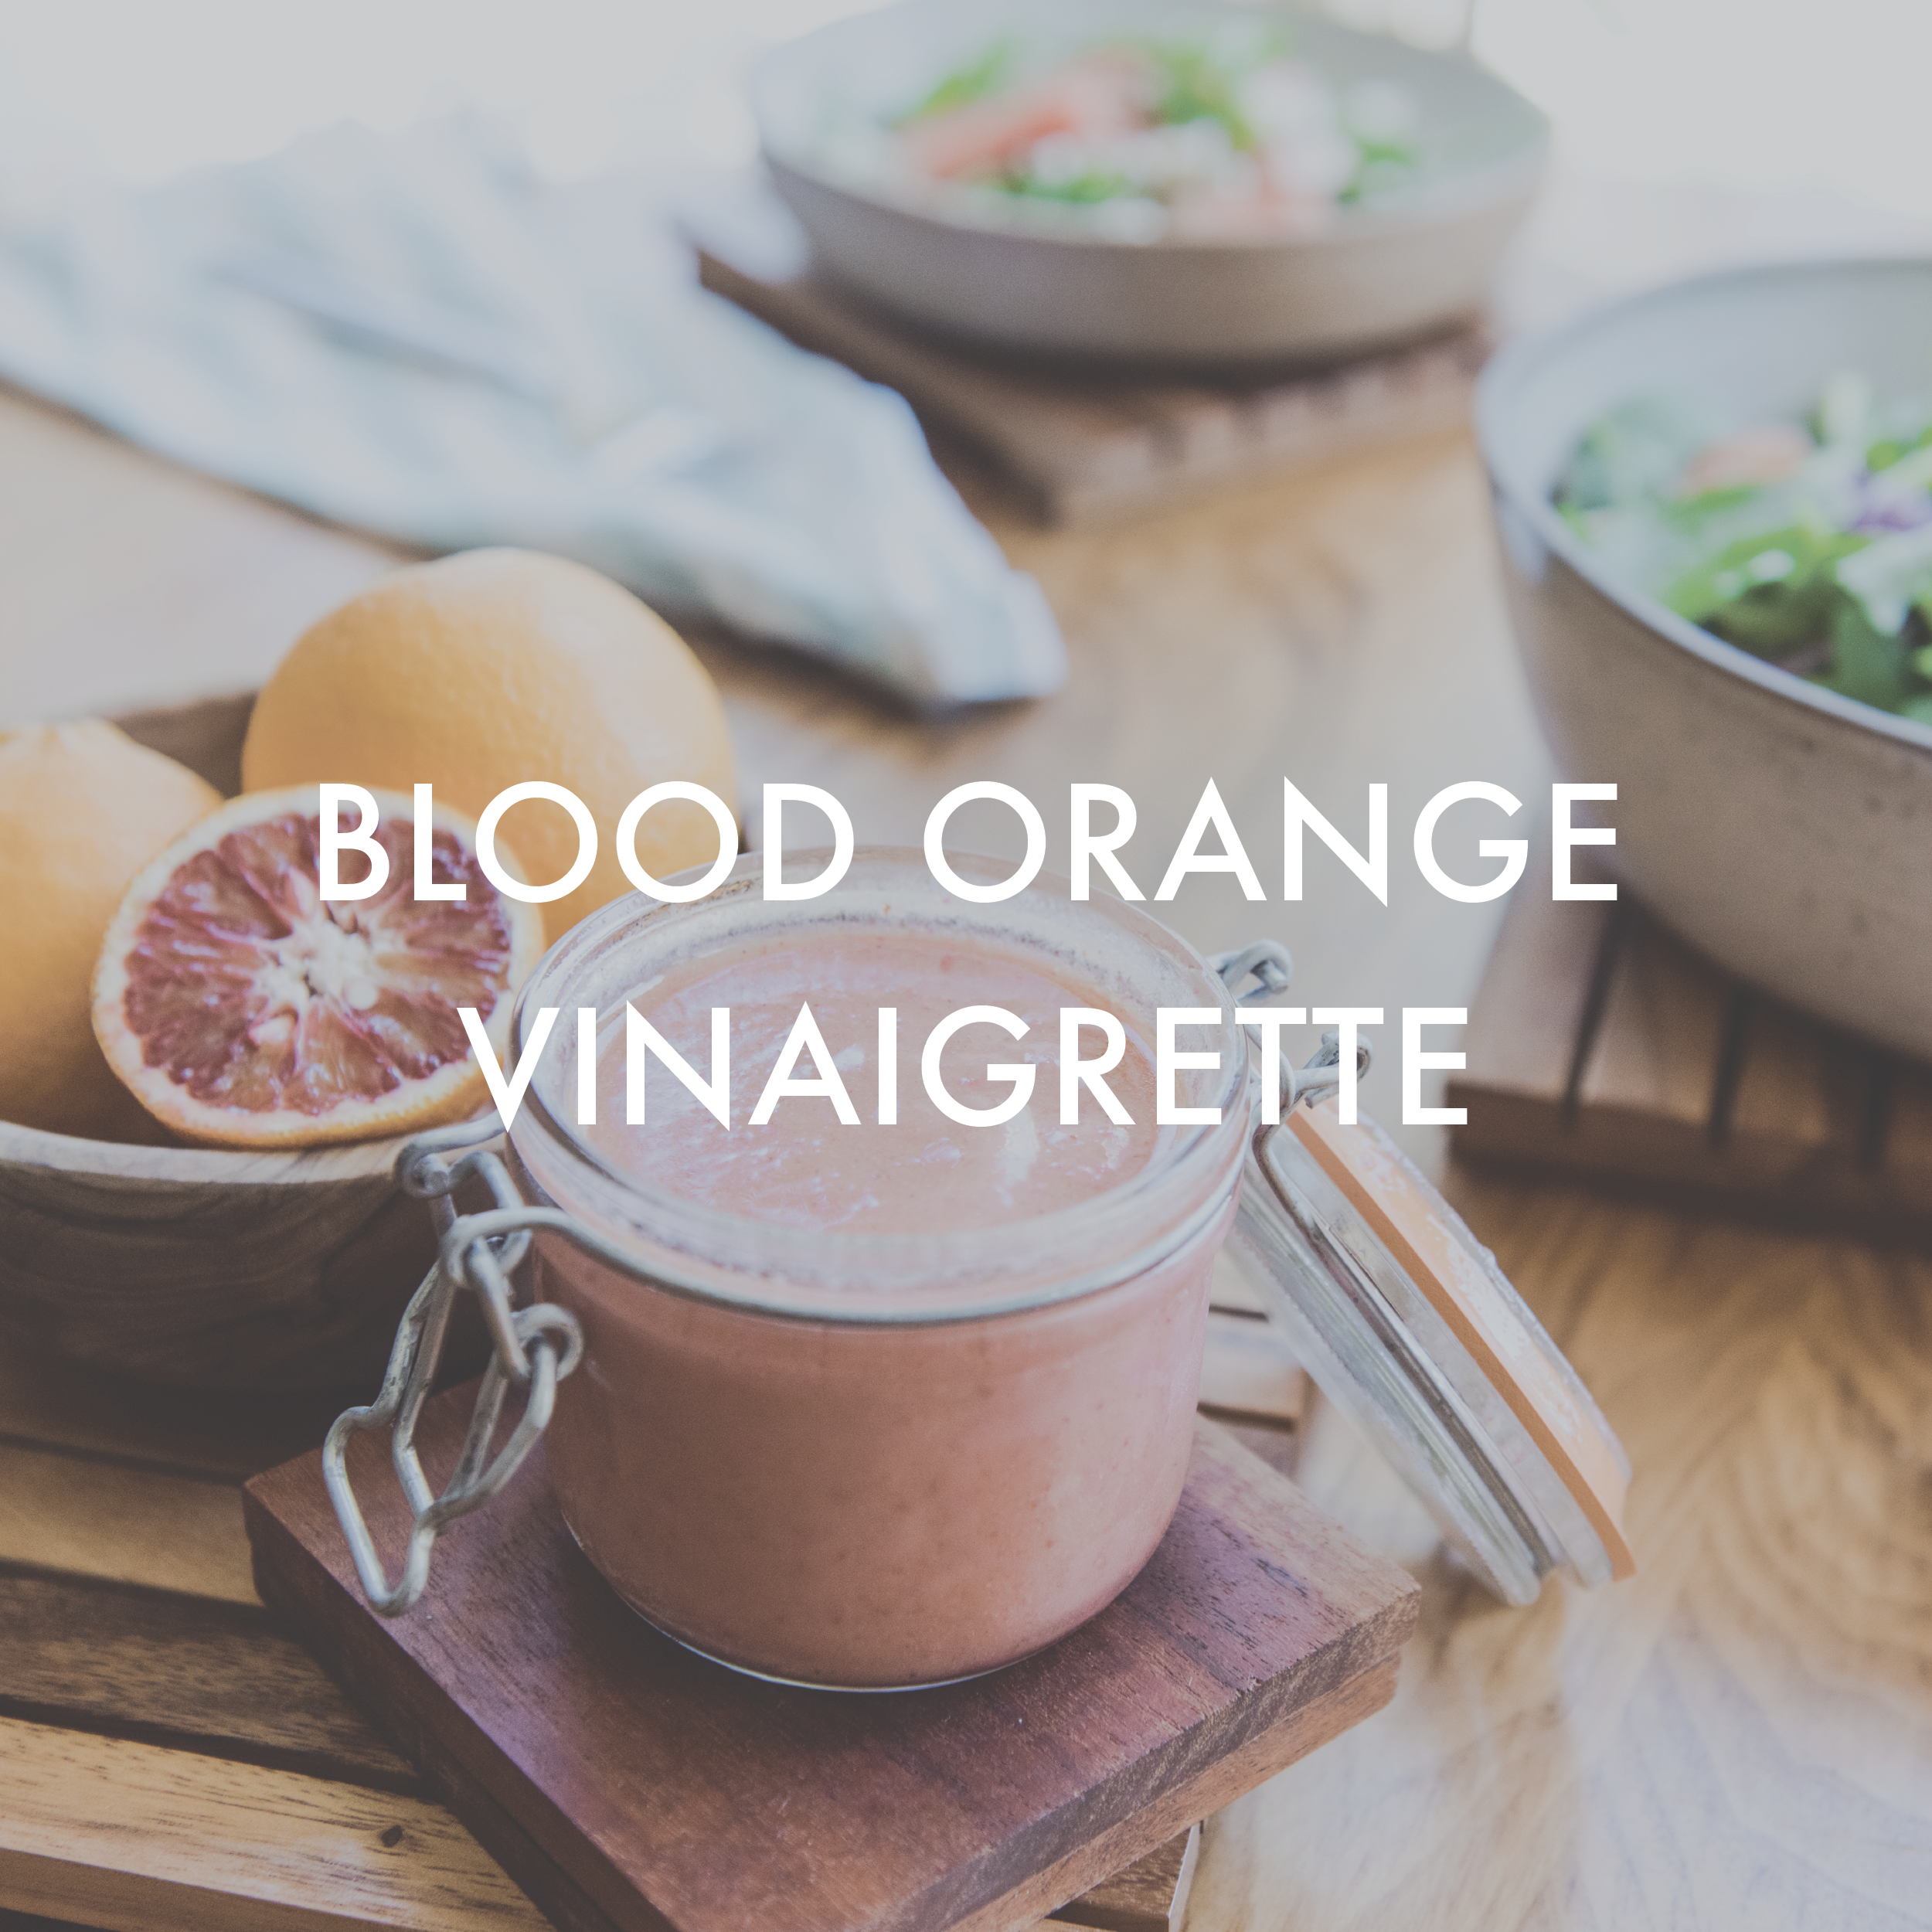 blood-orange-vinaigrette.png